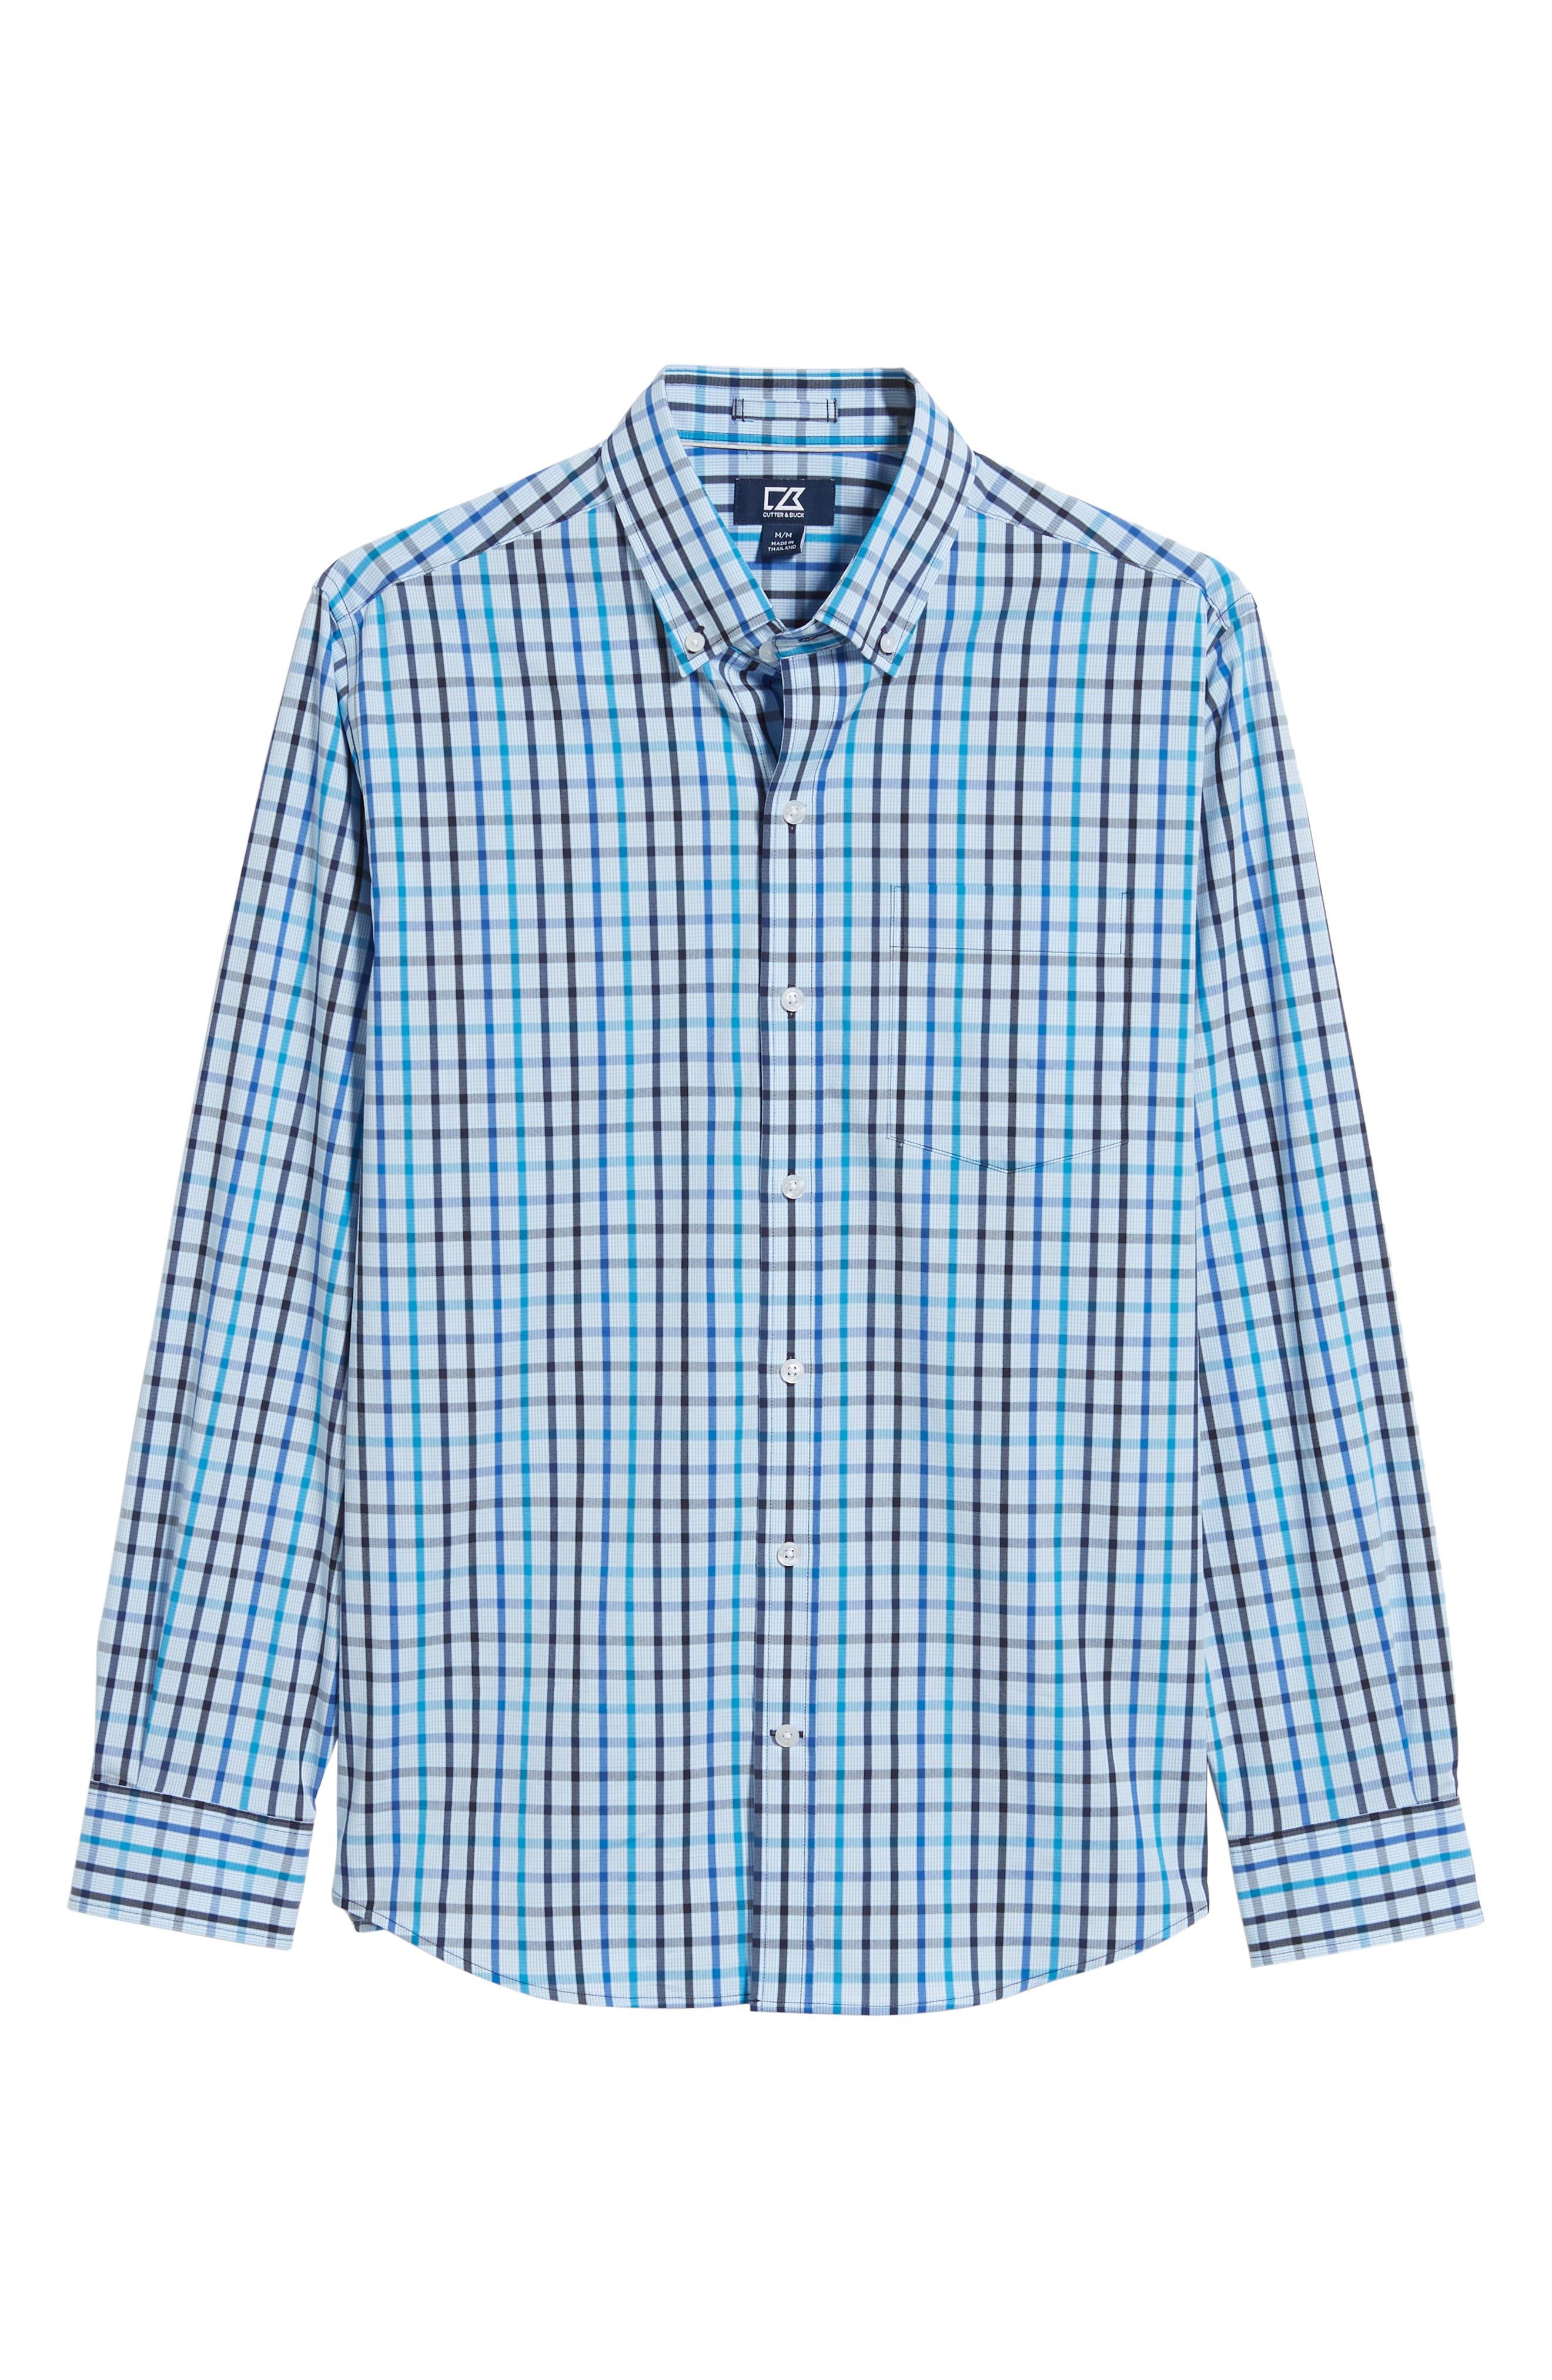 Clarence Regular Fit Plaid Sport Shirt,                             Alternate thumbnail 5, color,                             LIBERTY NAVY